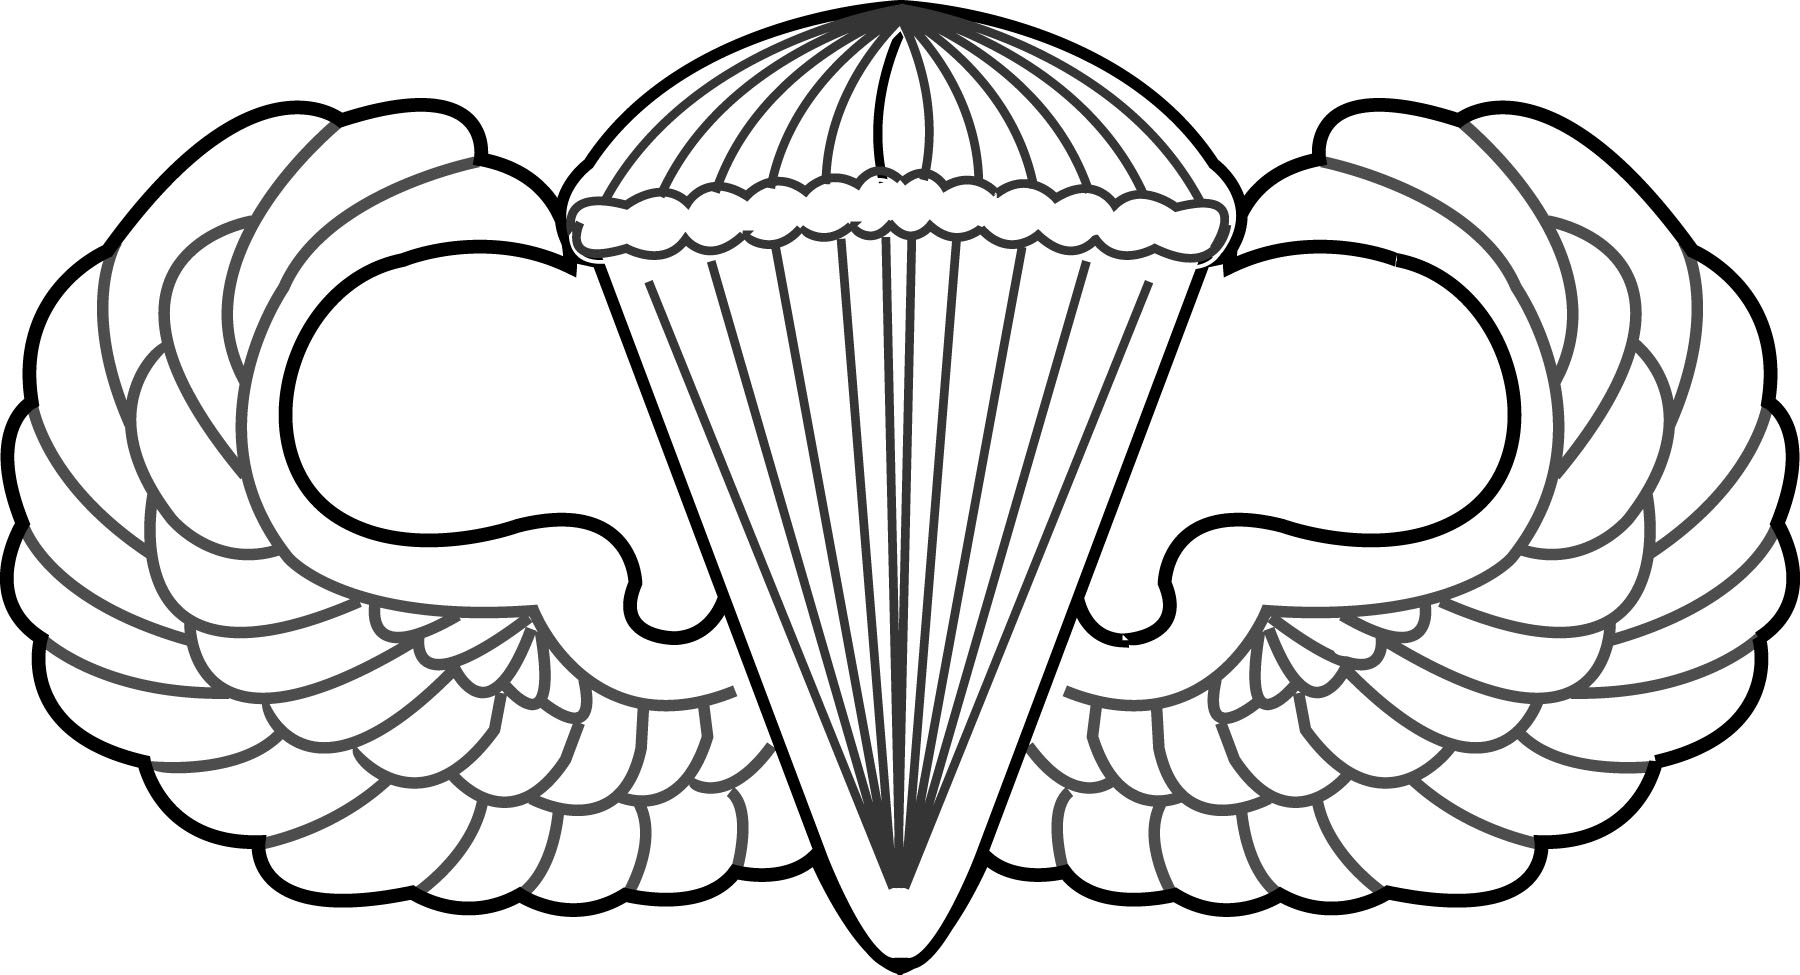 File:JumpWings.jpg - Wikimedia Commons